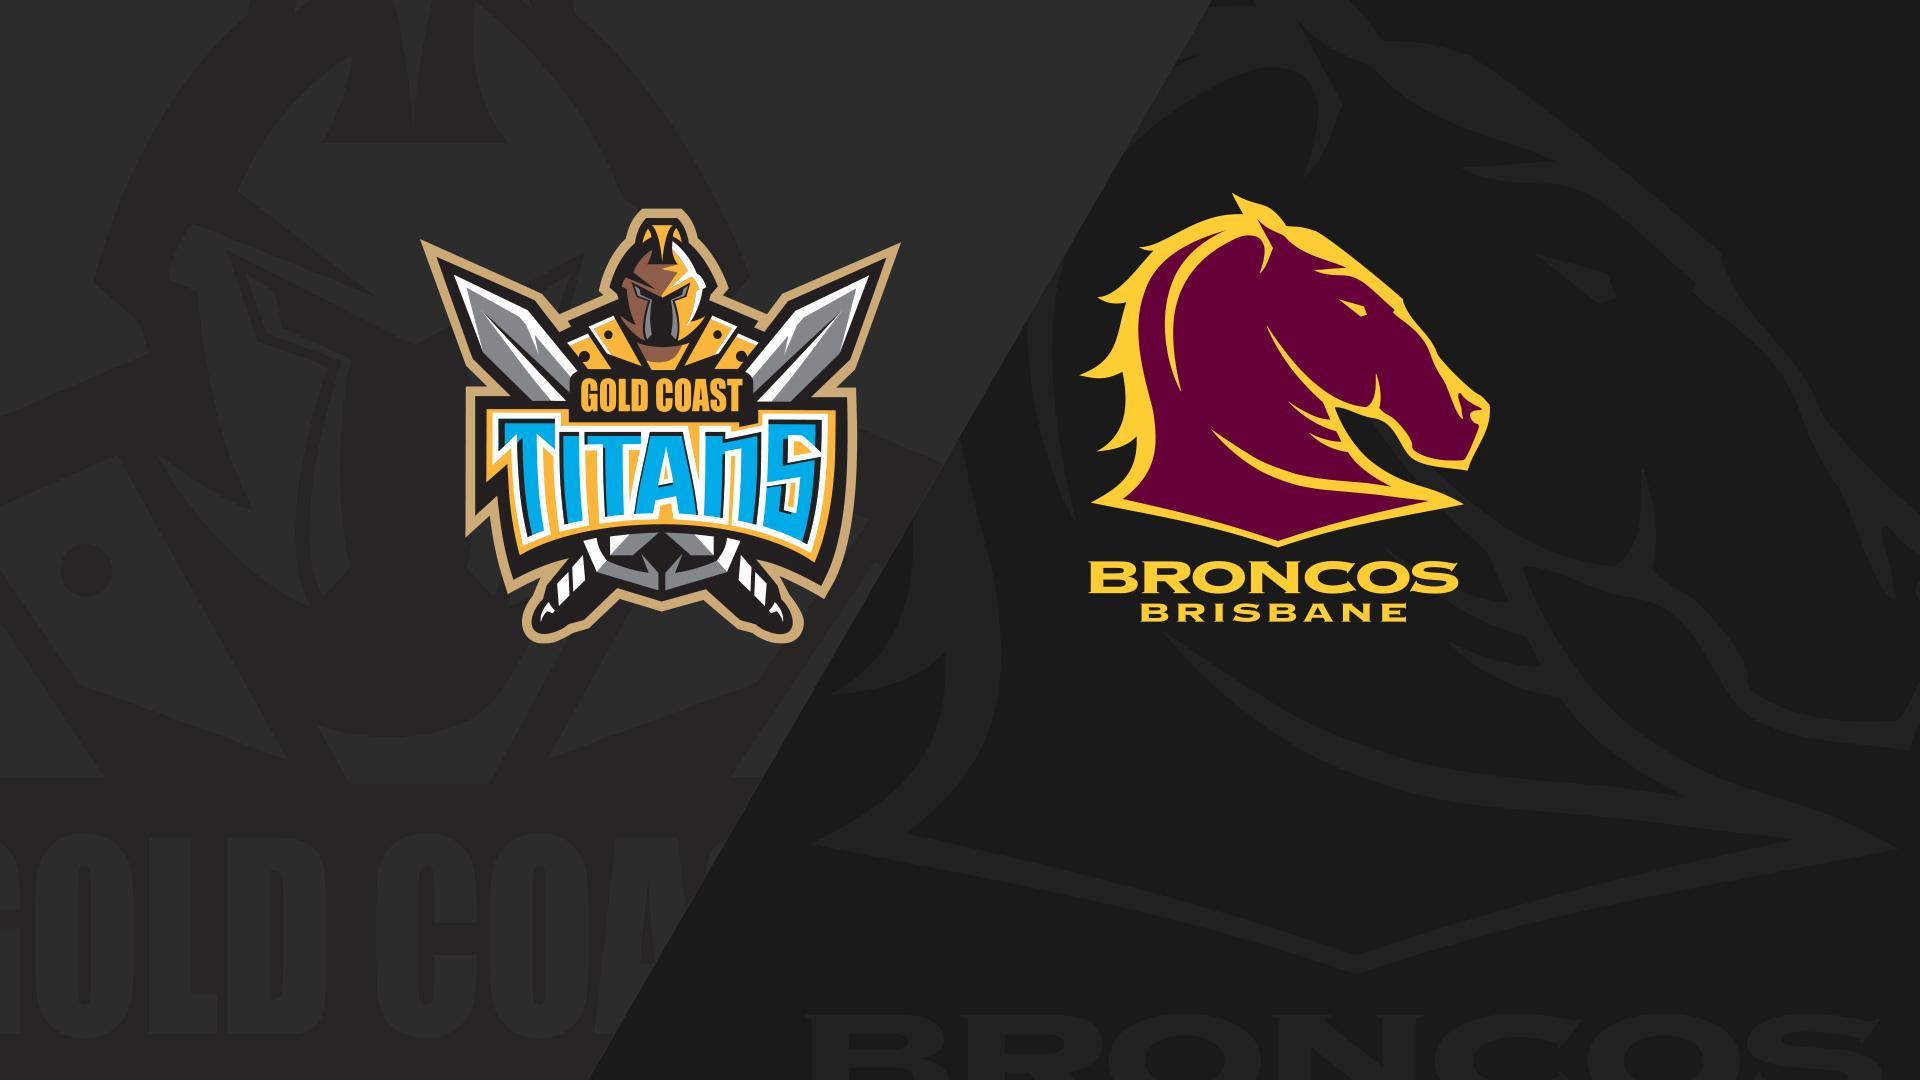 Full Match Replay: Titans v Broncos - Round 17, 2018